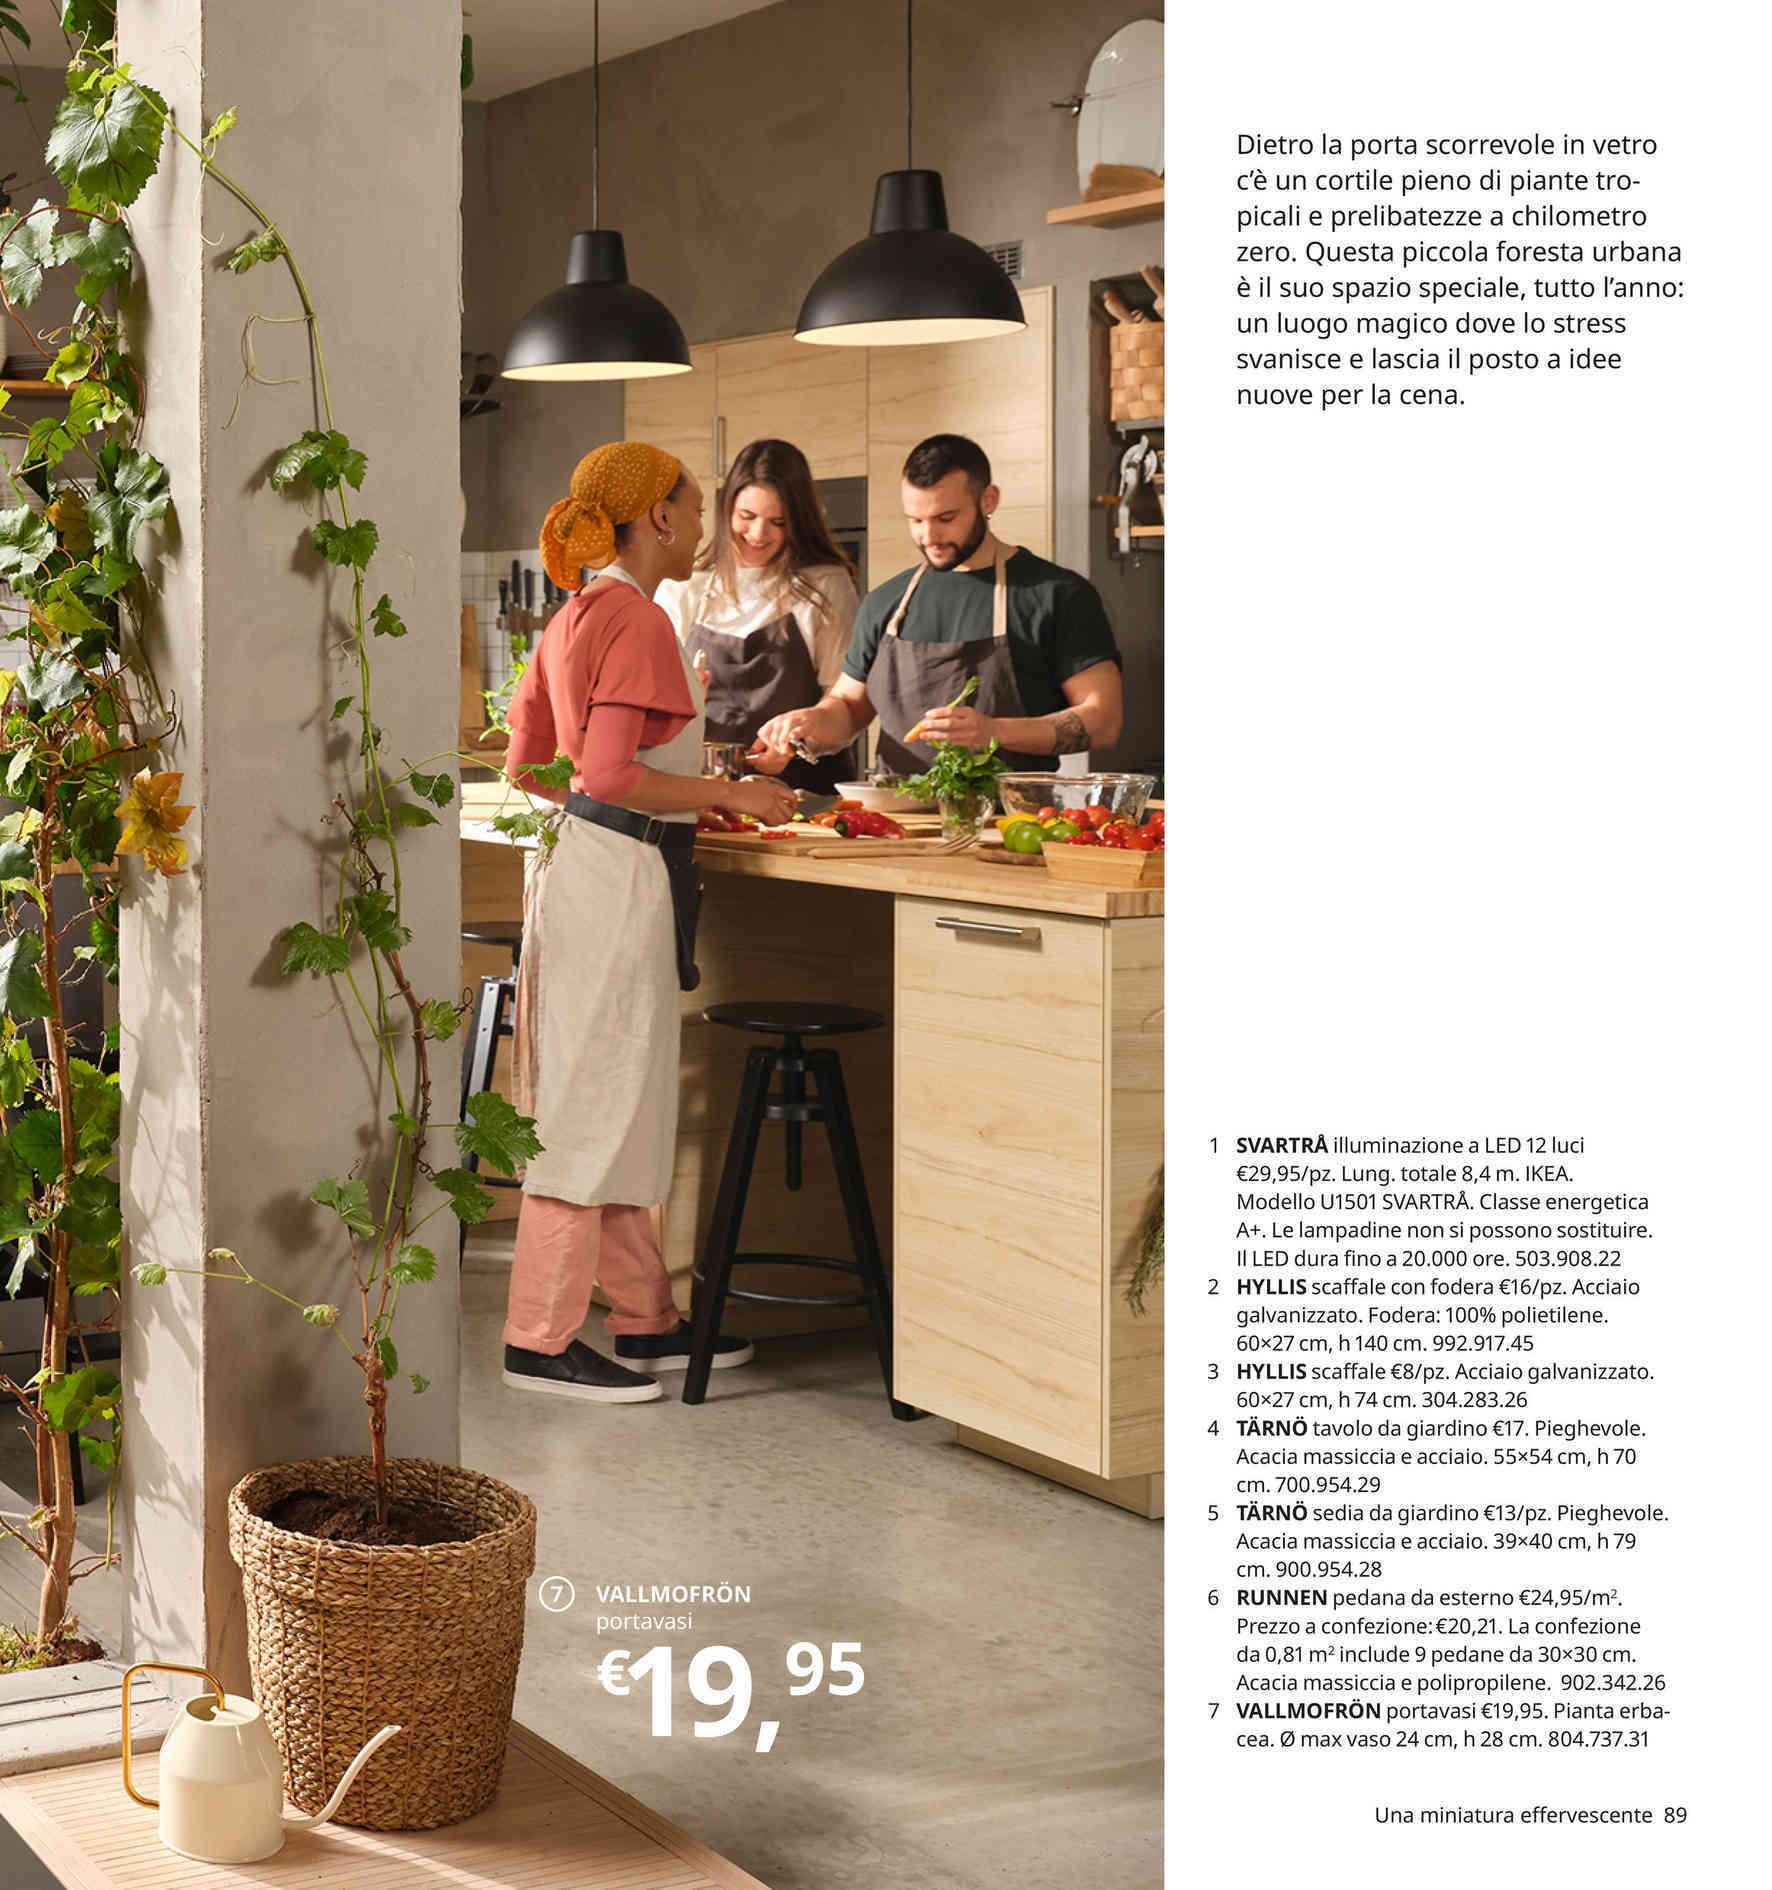 Offerte Tavoli da giardino nel volantino, prezzi negozio ...